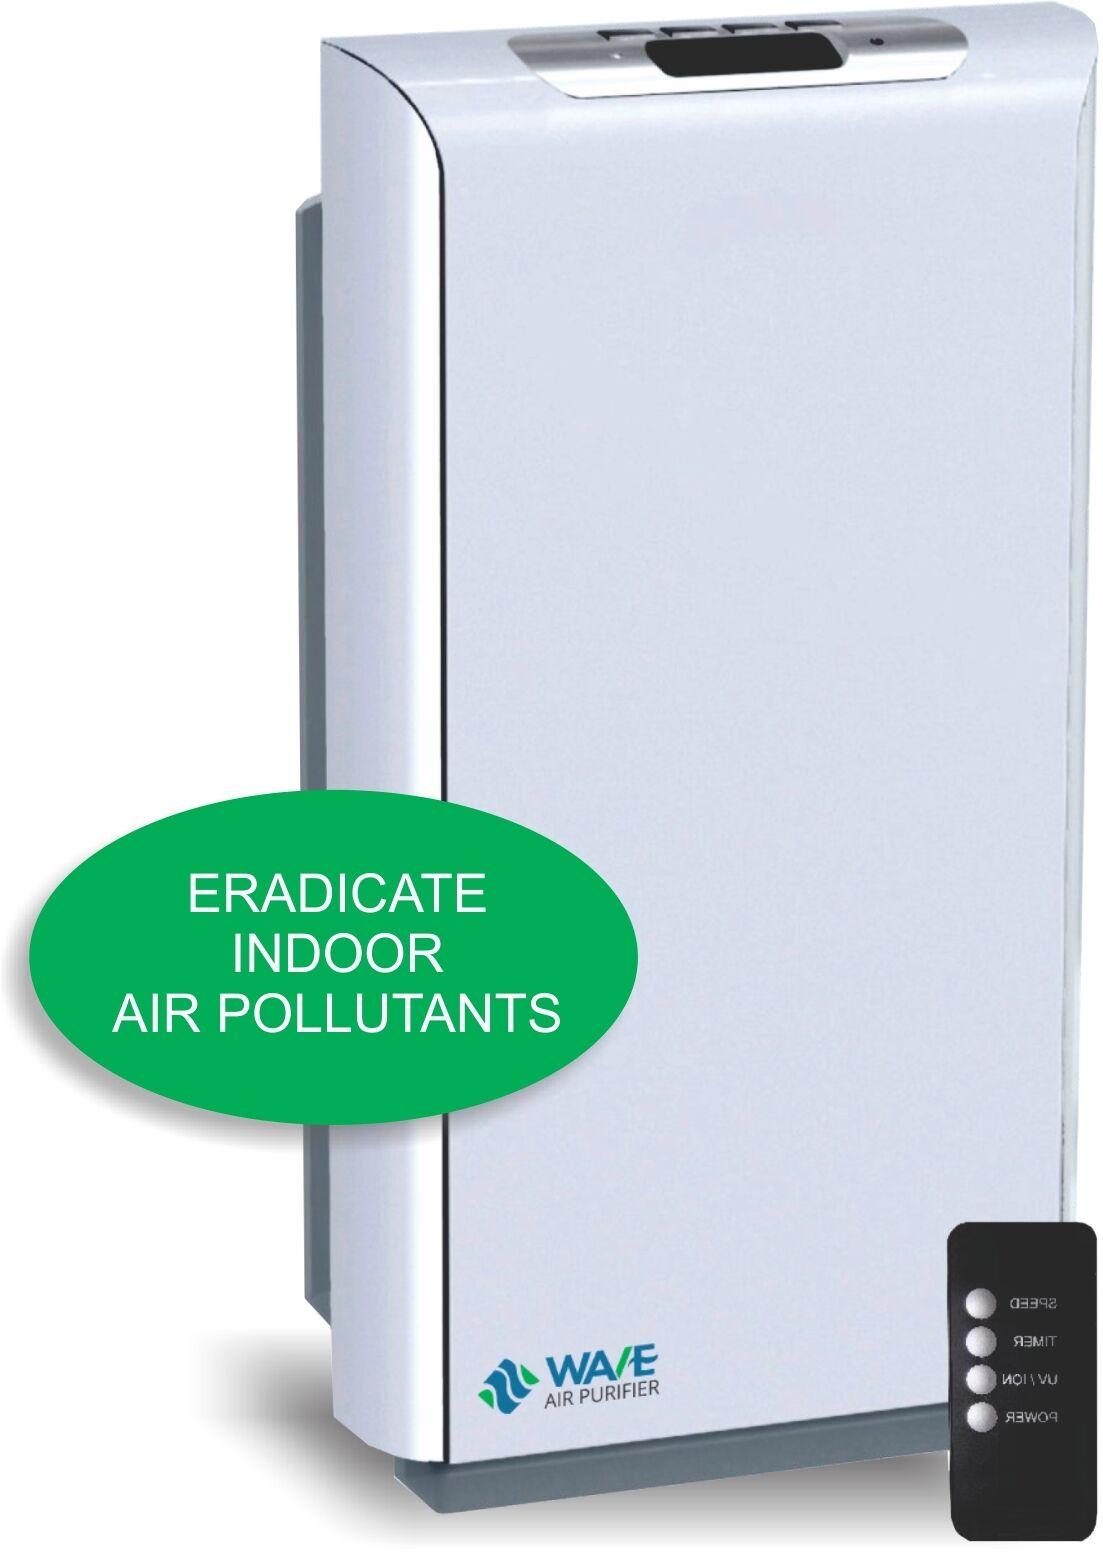 WAVE 6 Stage Portable Air Purifier - HEPA, Dual UV, 800 sq. ft. Remote, Sensor